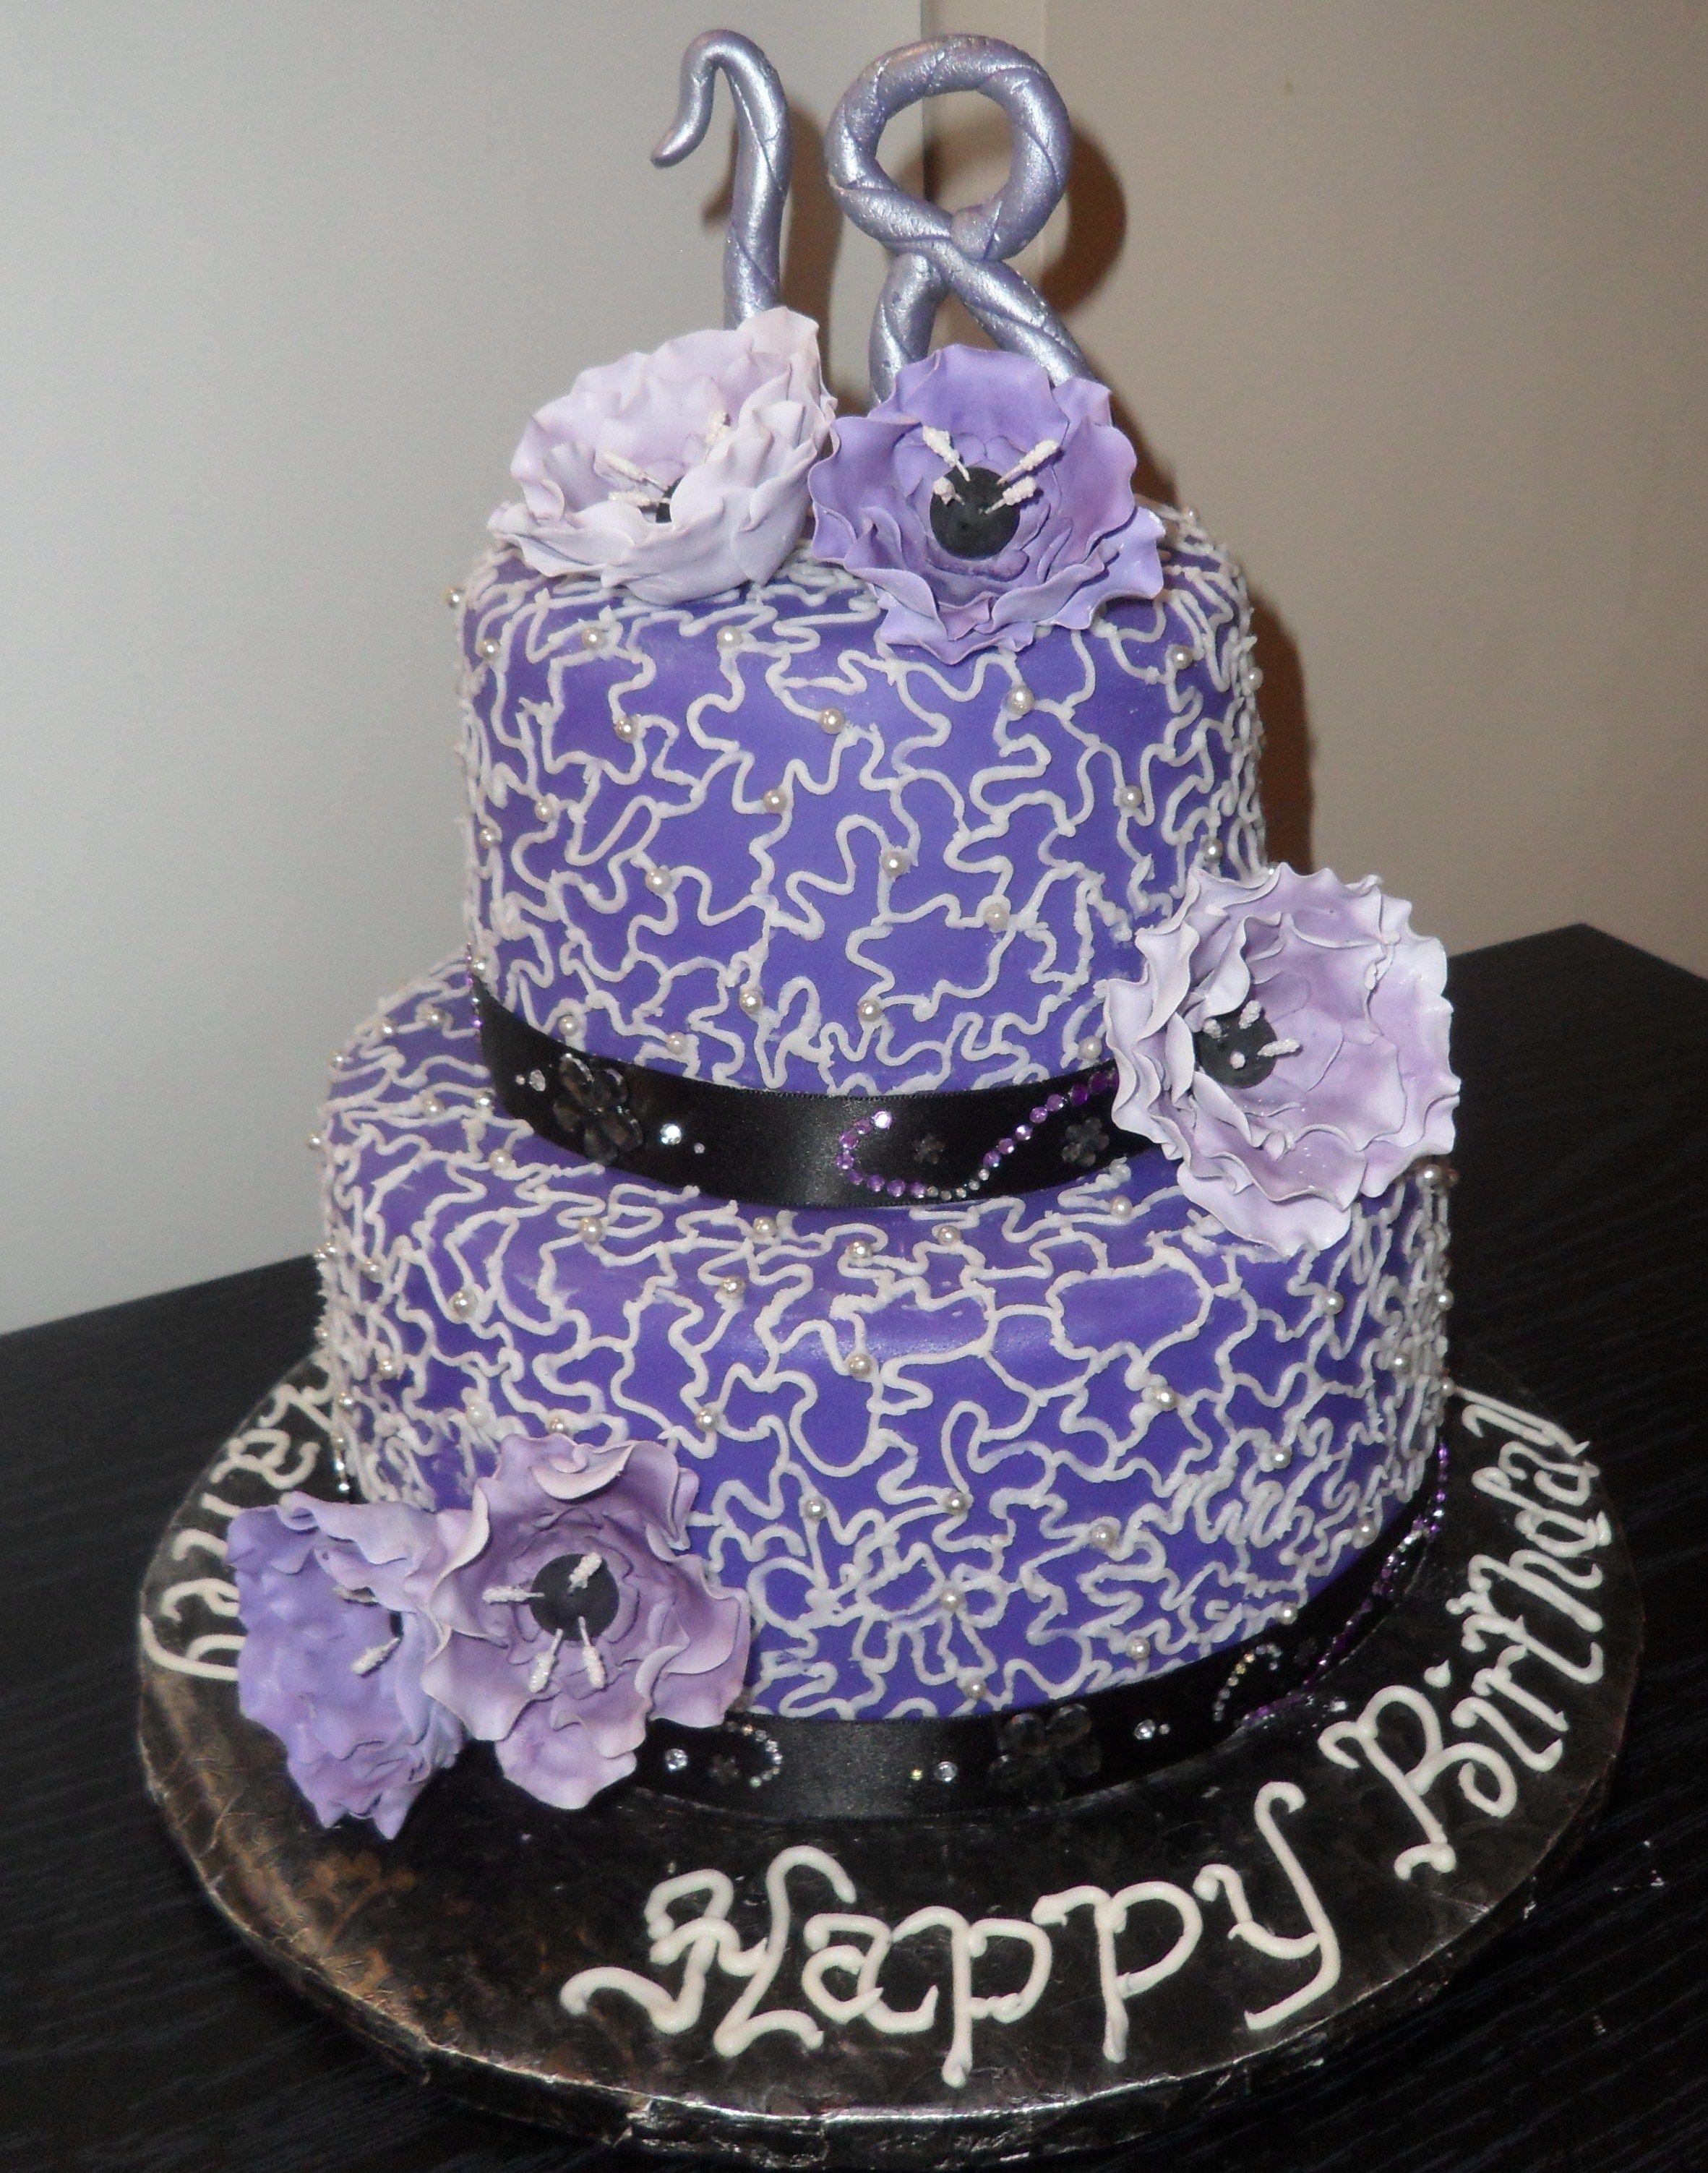 18th birthday cake with purple fantasy flowers